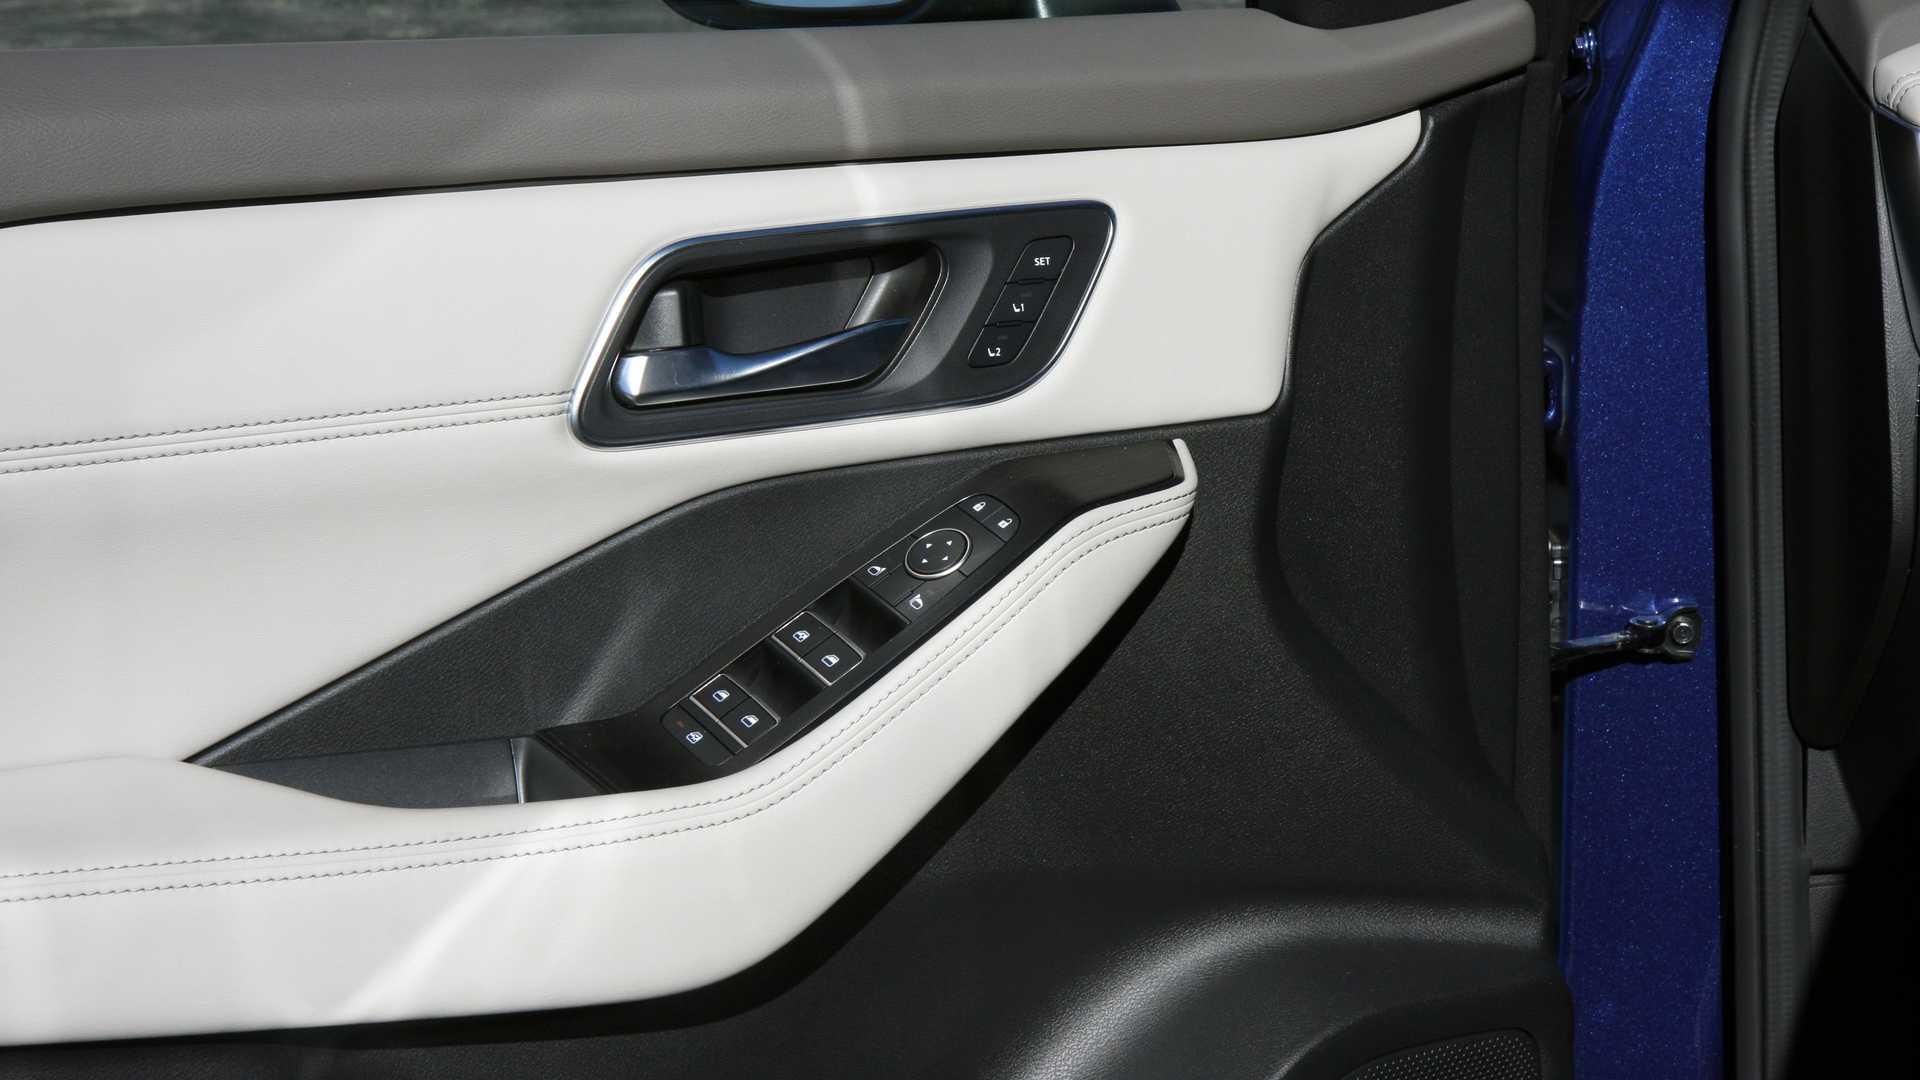 2021 nissan rogue sl interior door panel